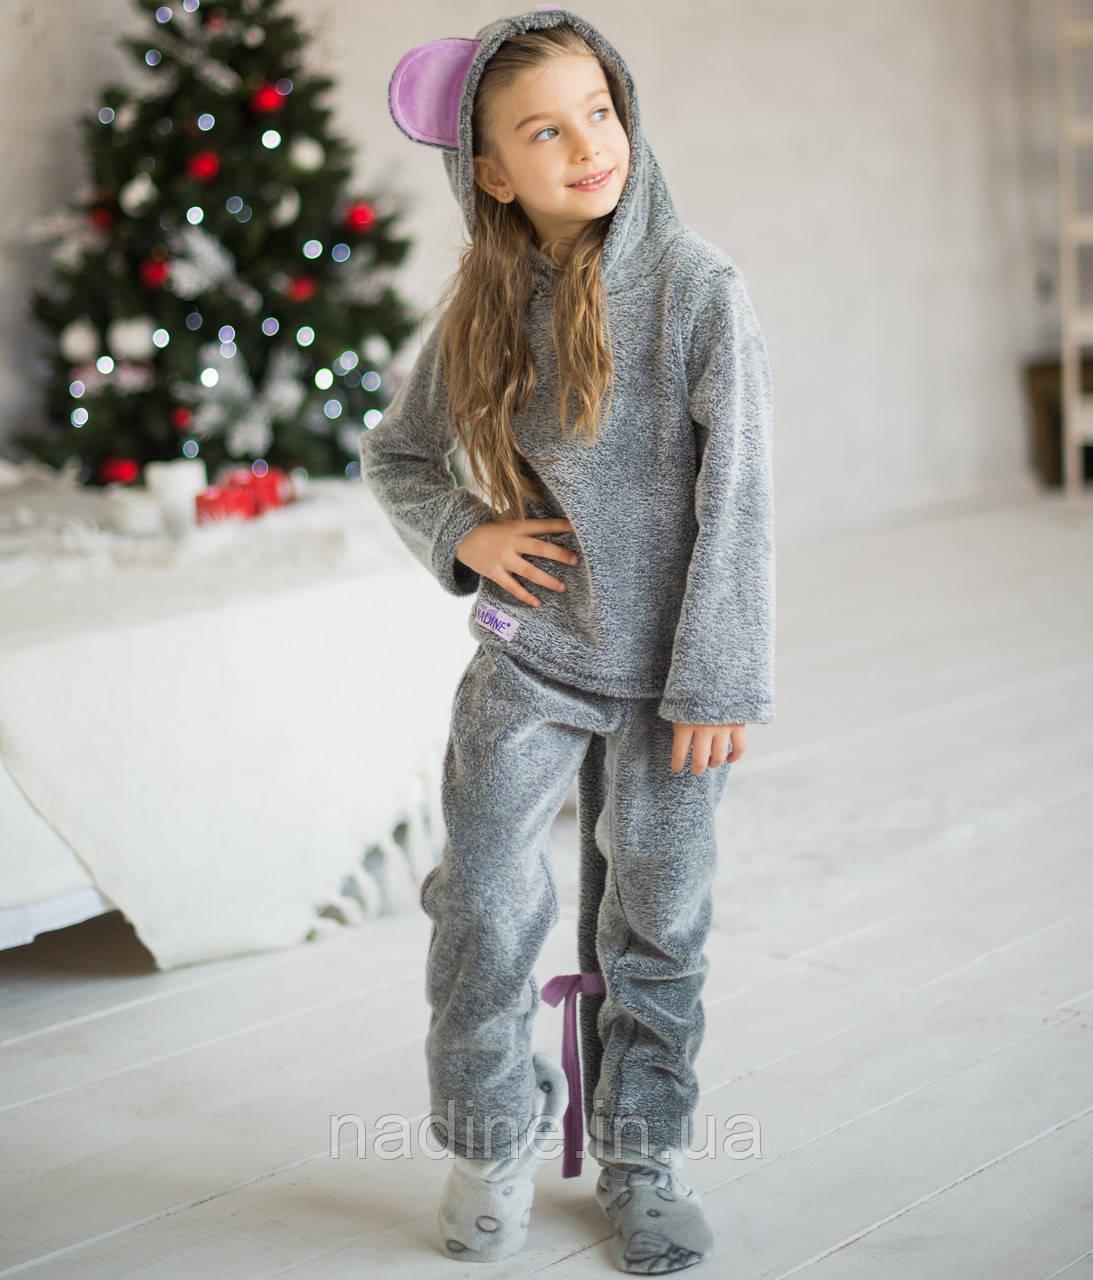 Детская пижама Мышка Eirena Nadine (723-34) символ года на рост 134Серая